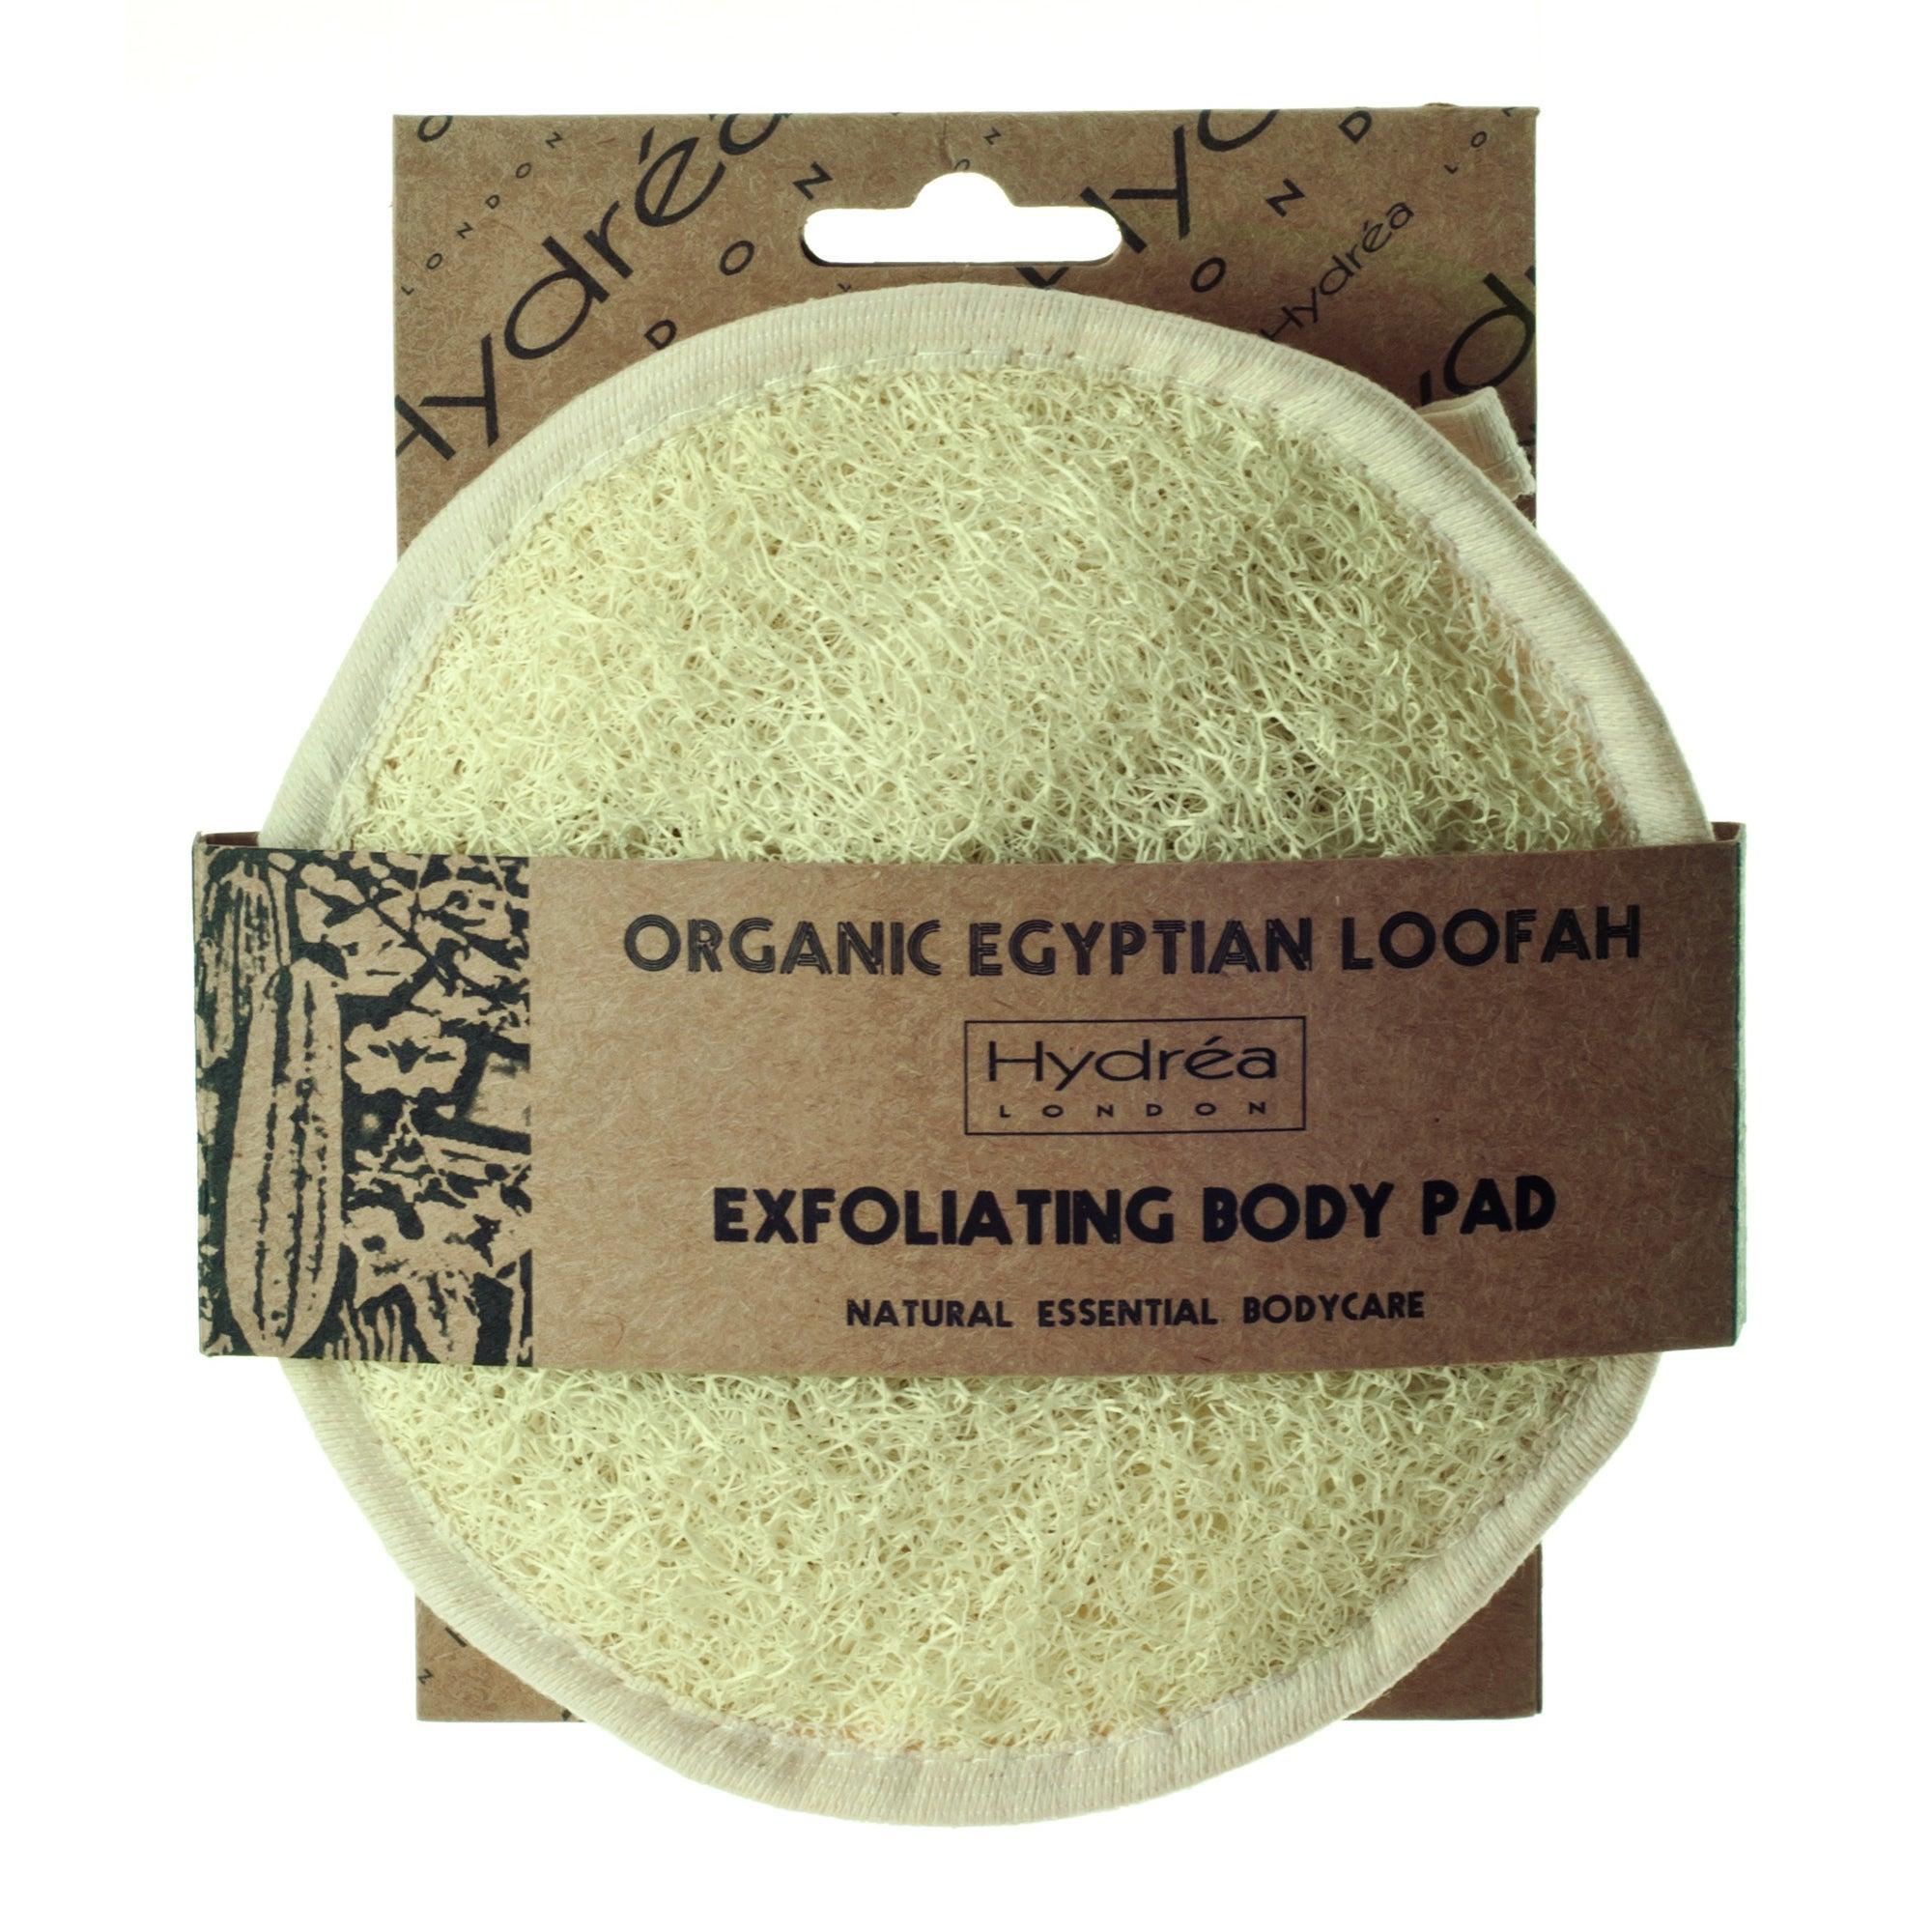 Hydrea Organic Egyptian Loofah Exfoliating Body Pad